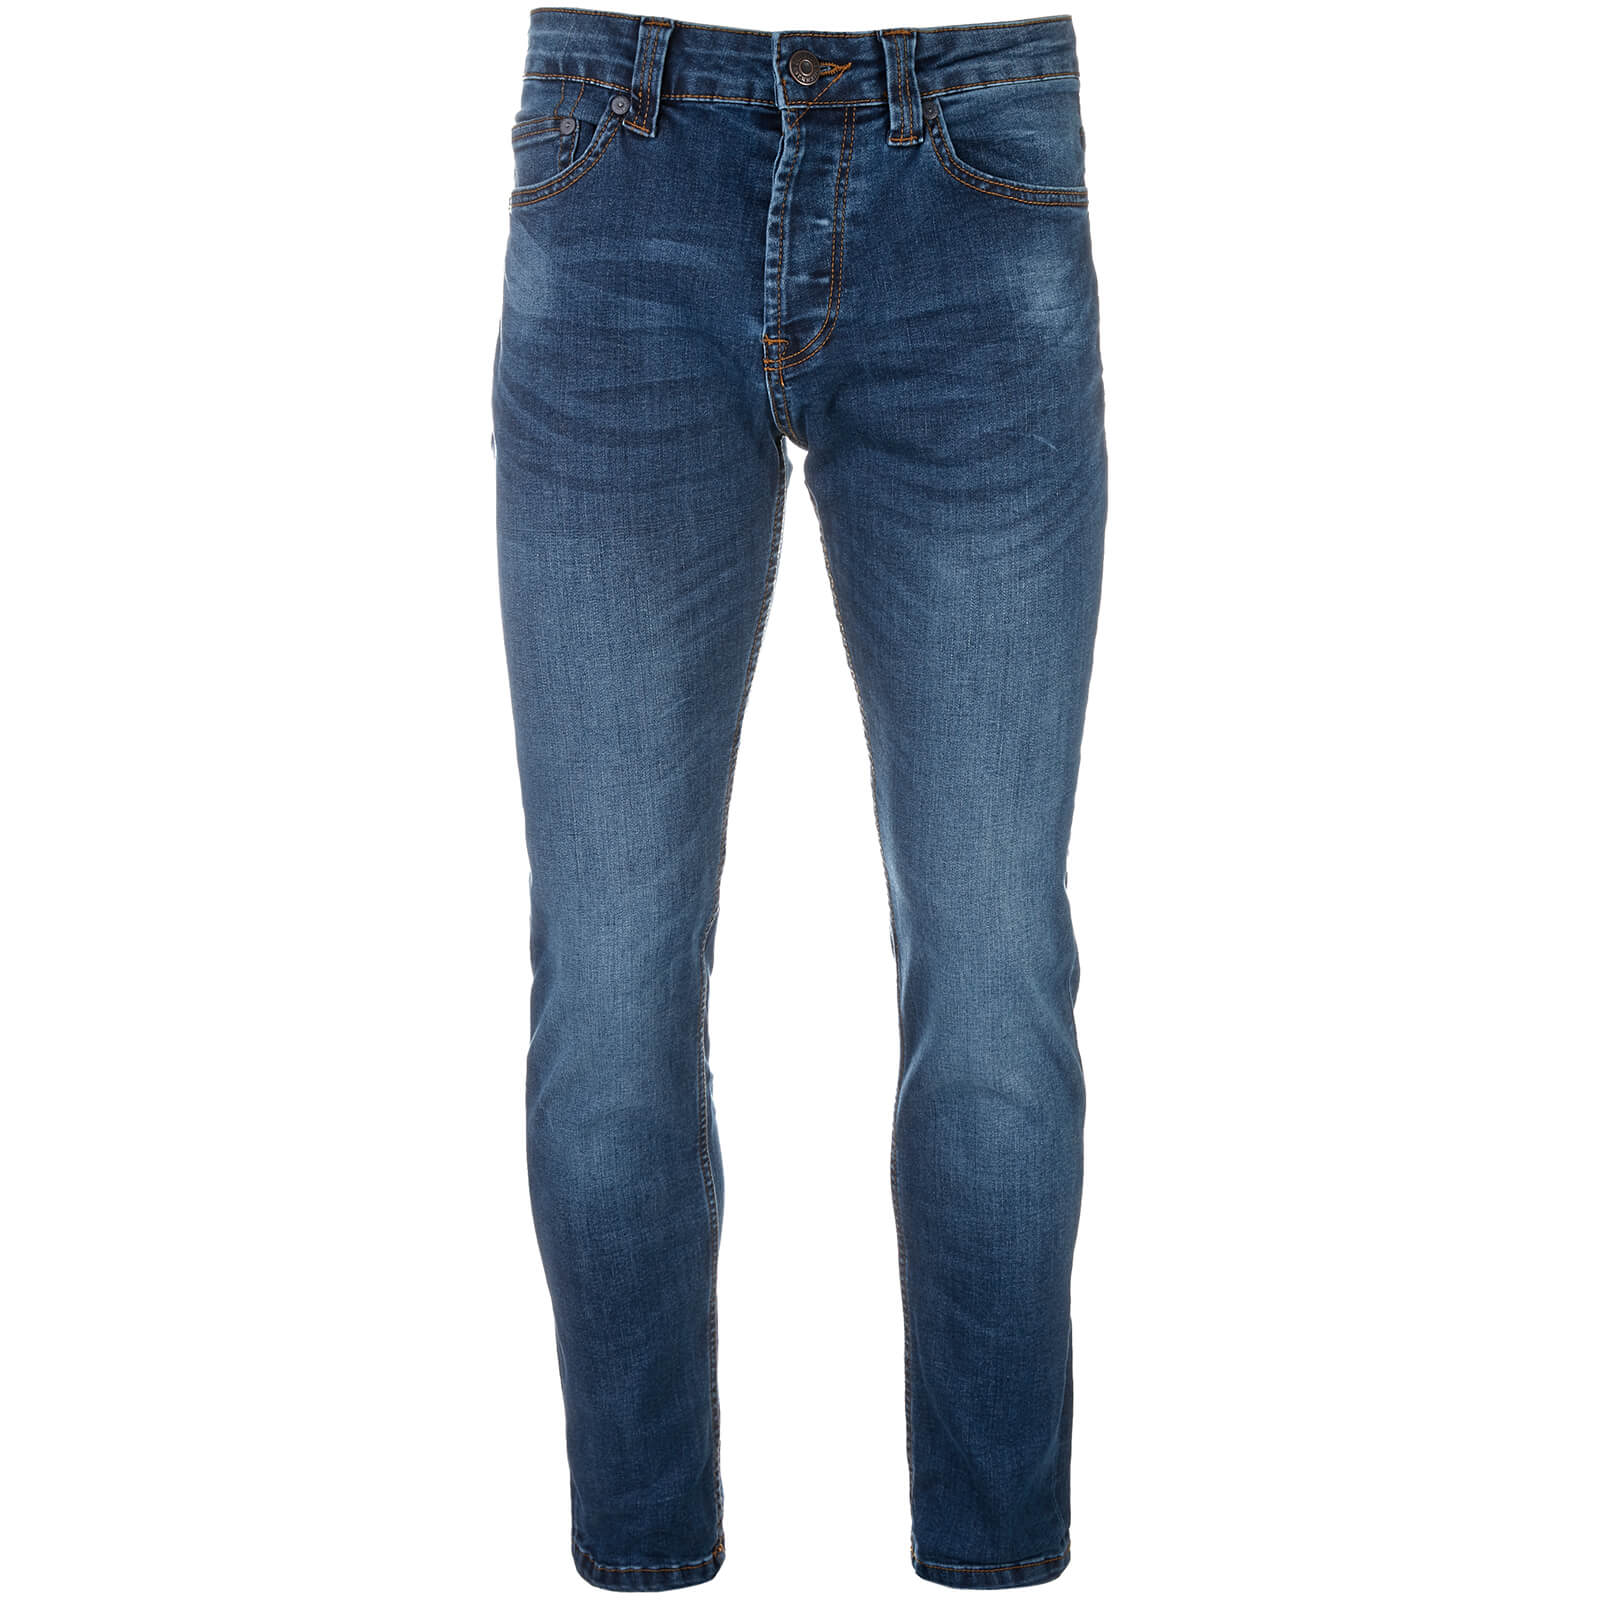 Mens Designer style Smith /& Jones Cotton Dark Blue Denims Regular Fit New FURIO